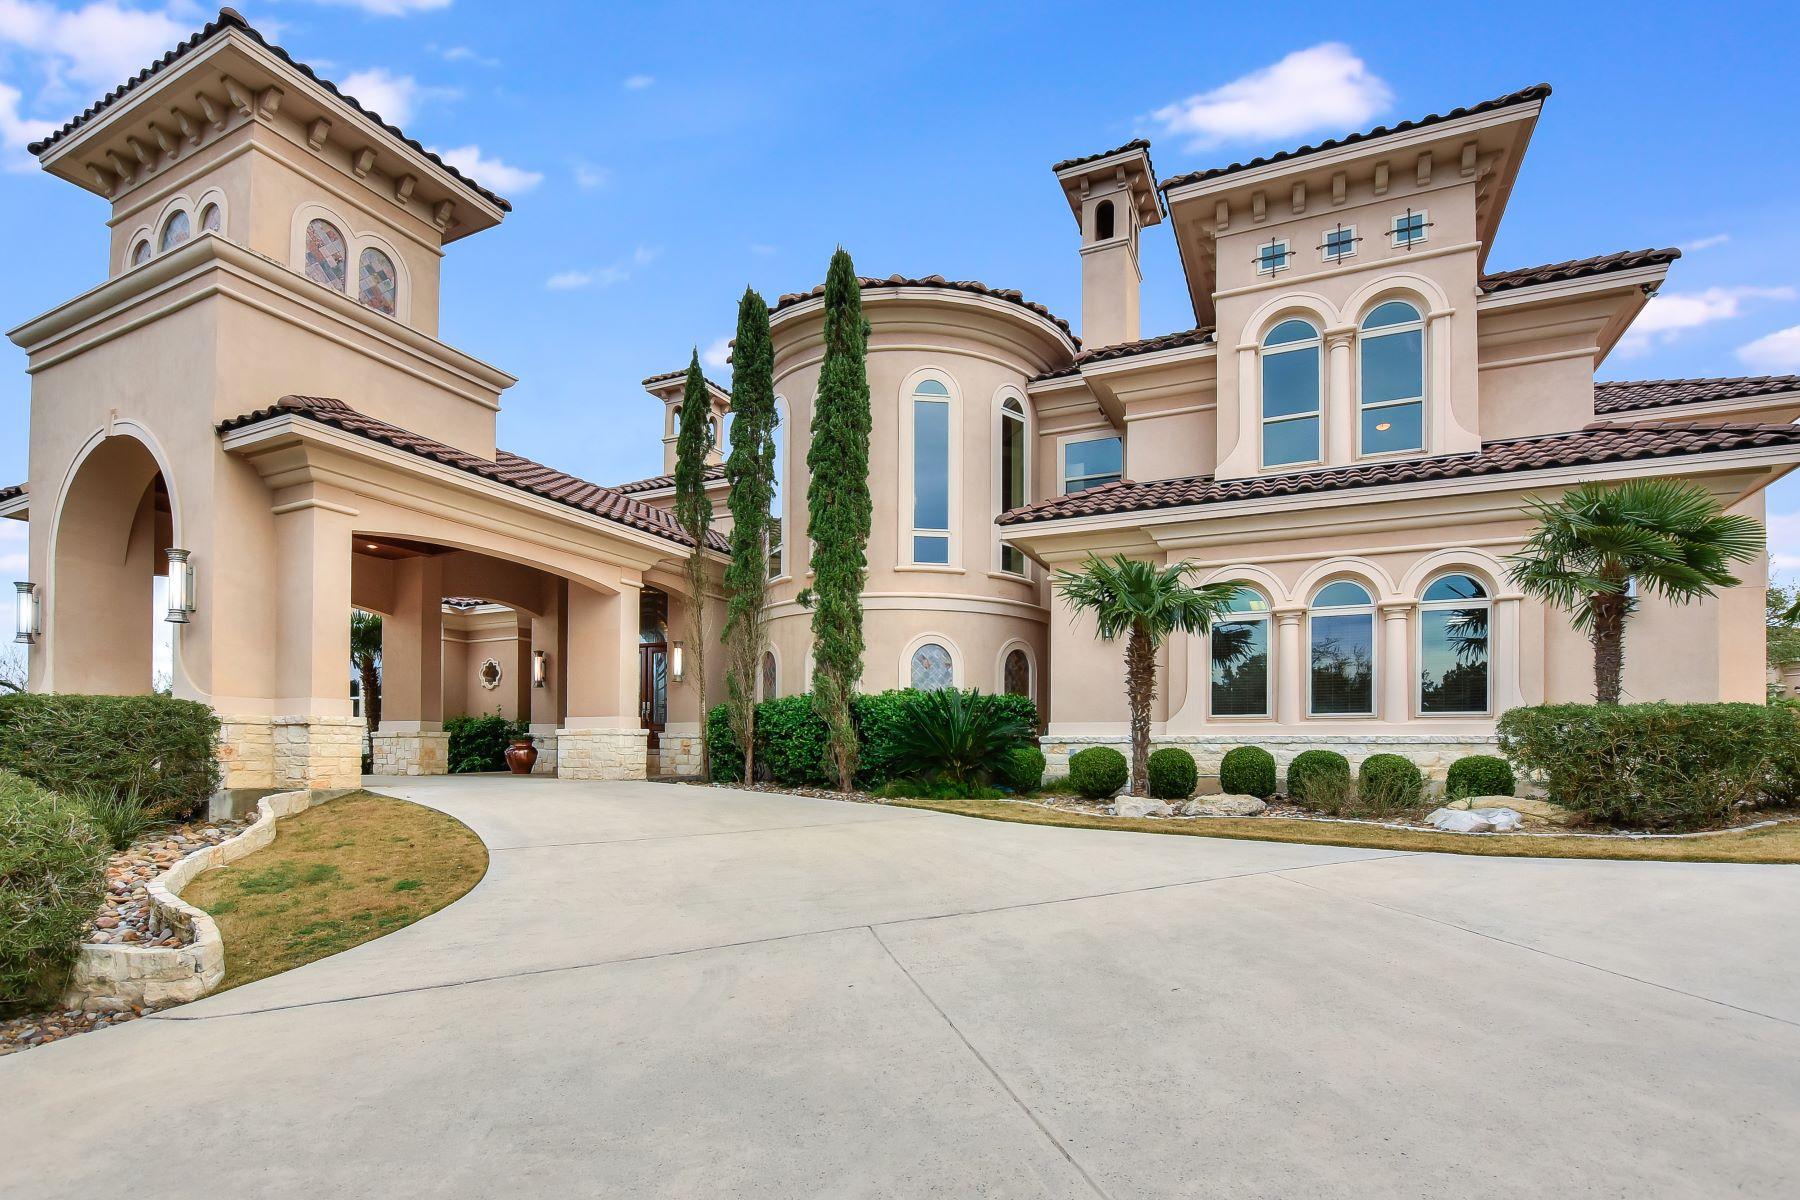 Single Family Homes for Sale at 24902 Miranda Ridge, Boerne, TX 78006 24902 Miranda Ridge Boerne, Texas 78006 United States